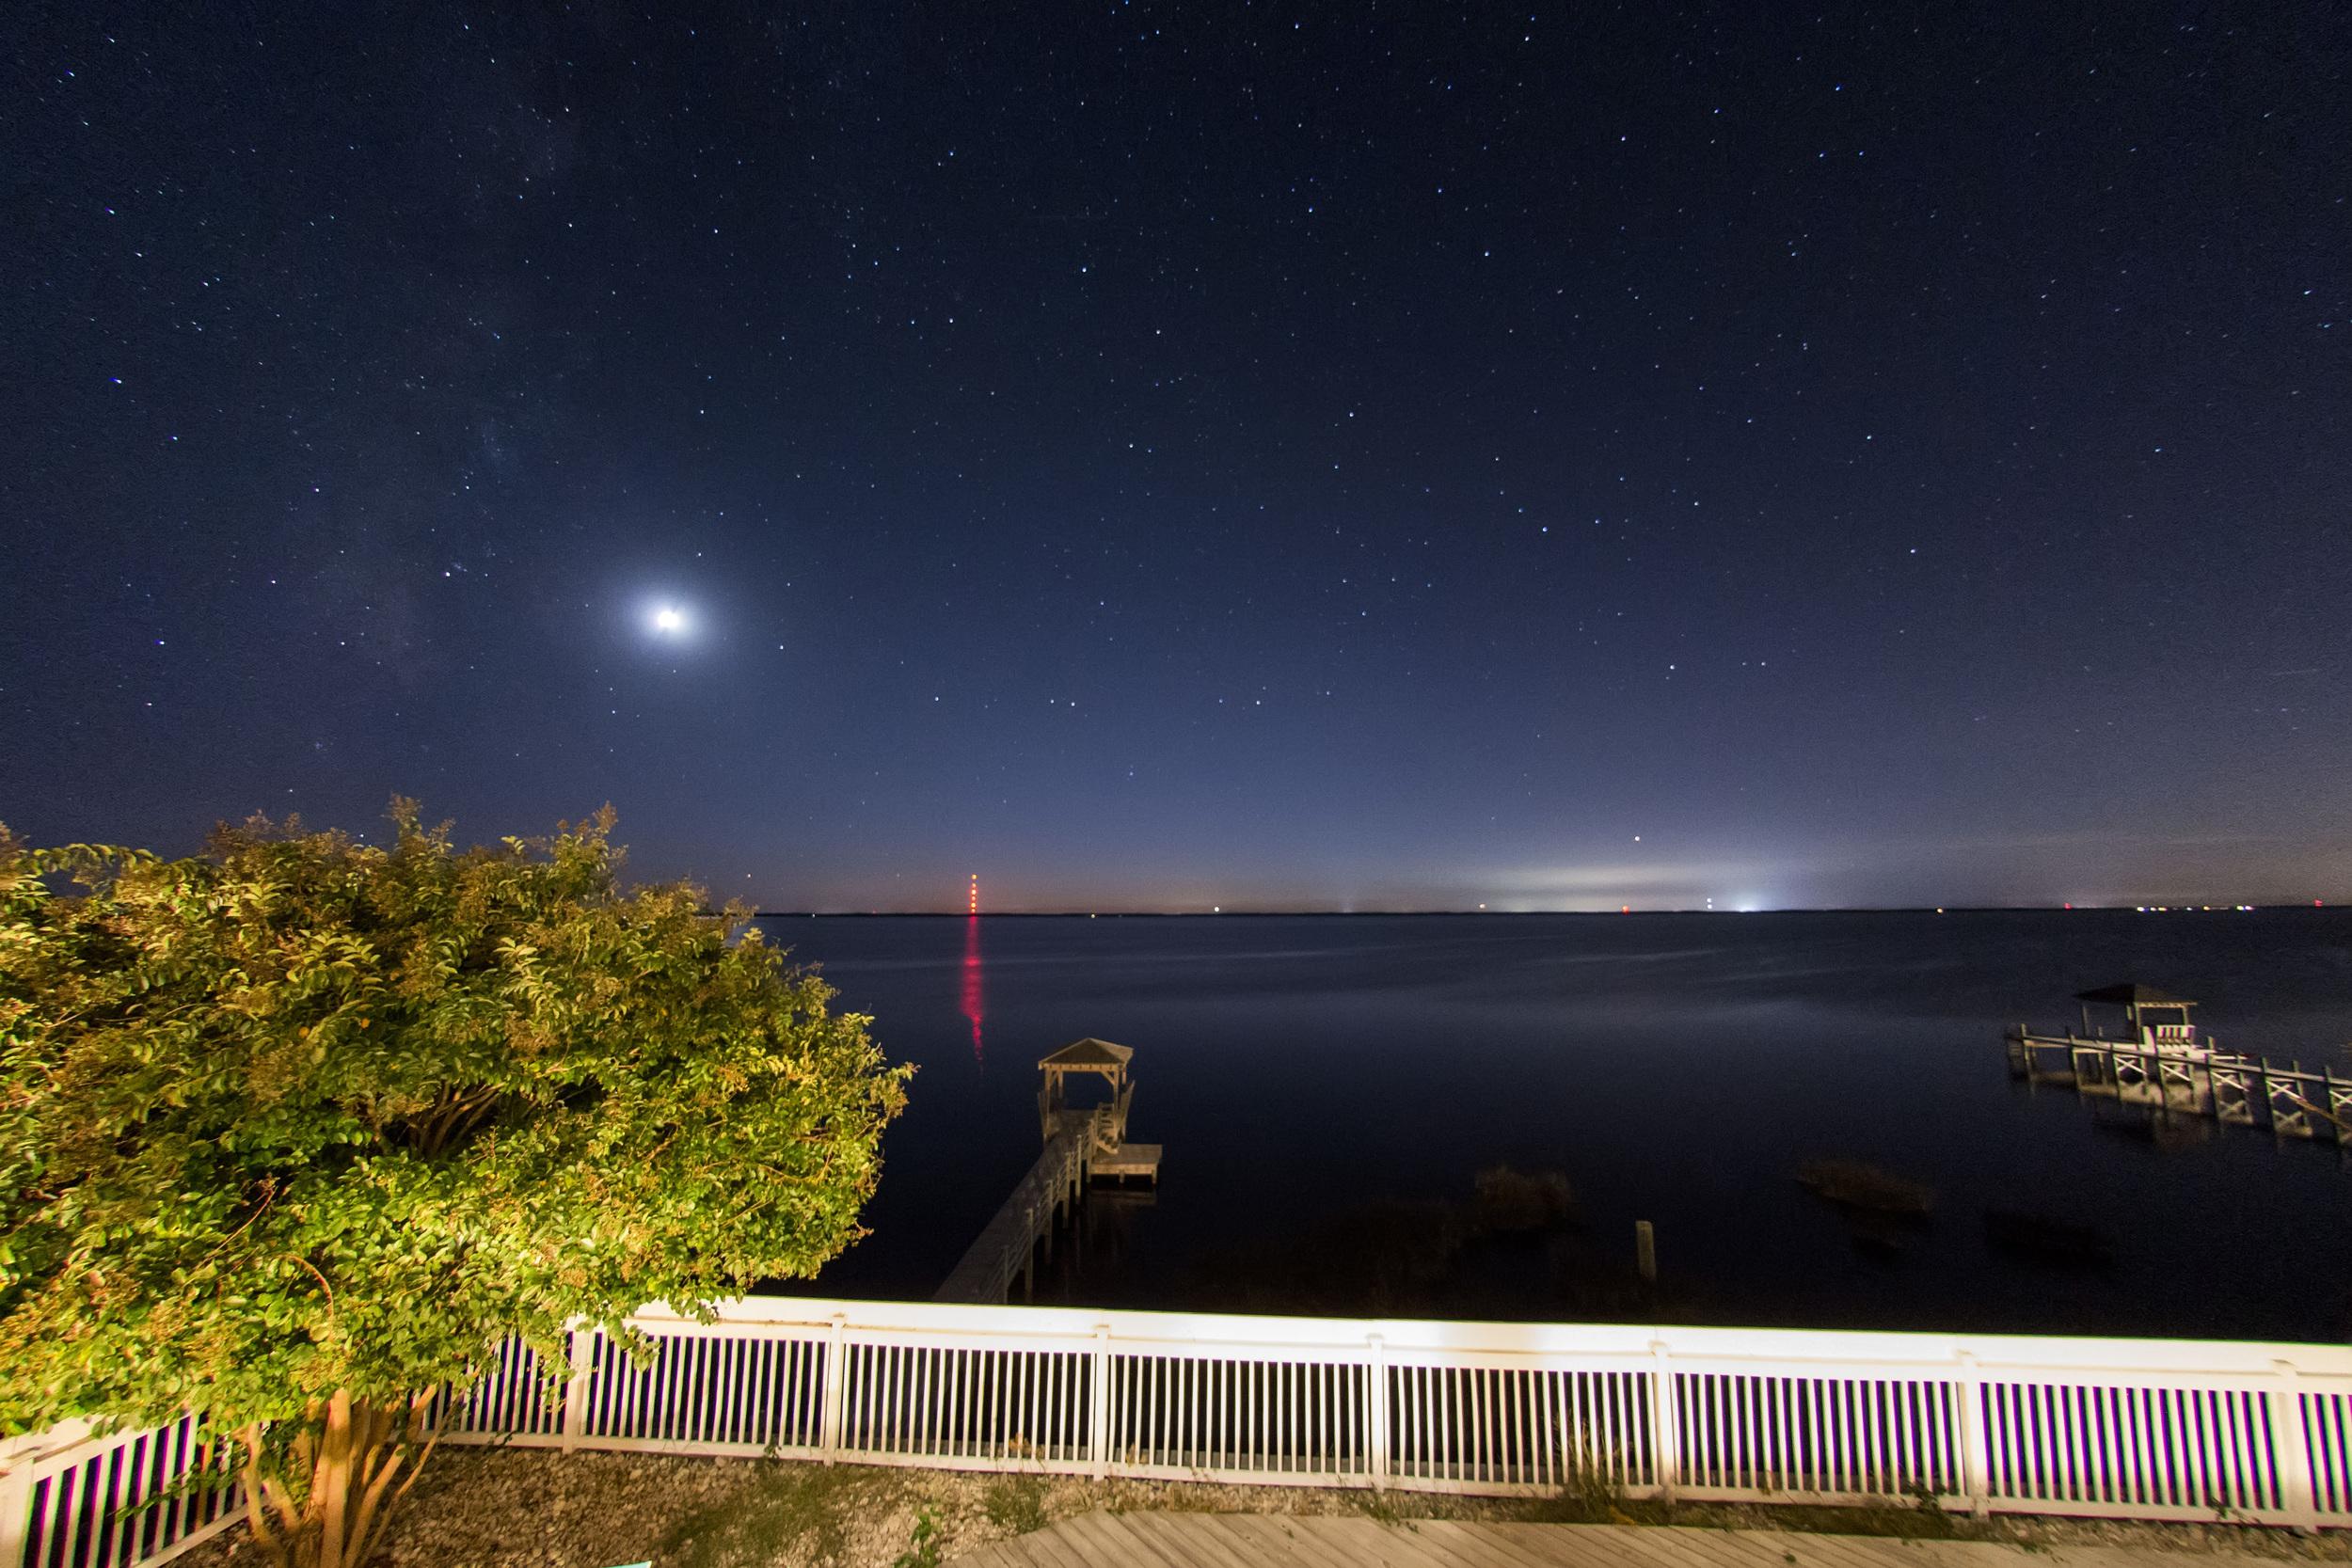 OBX starry night